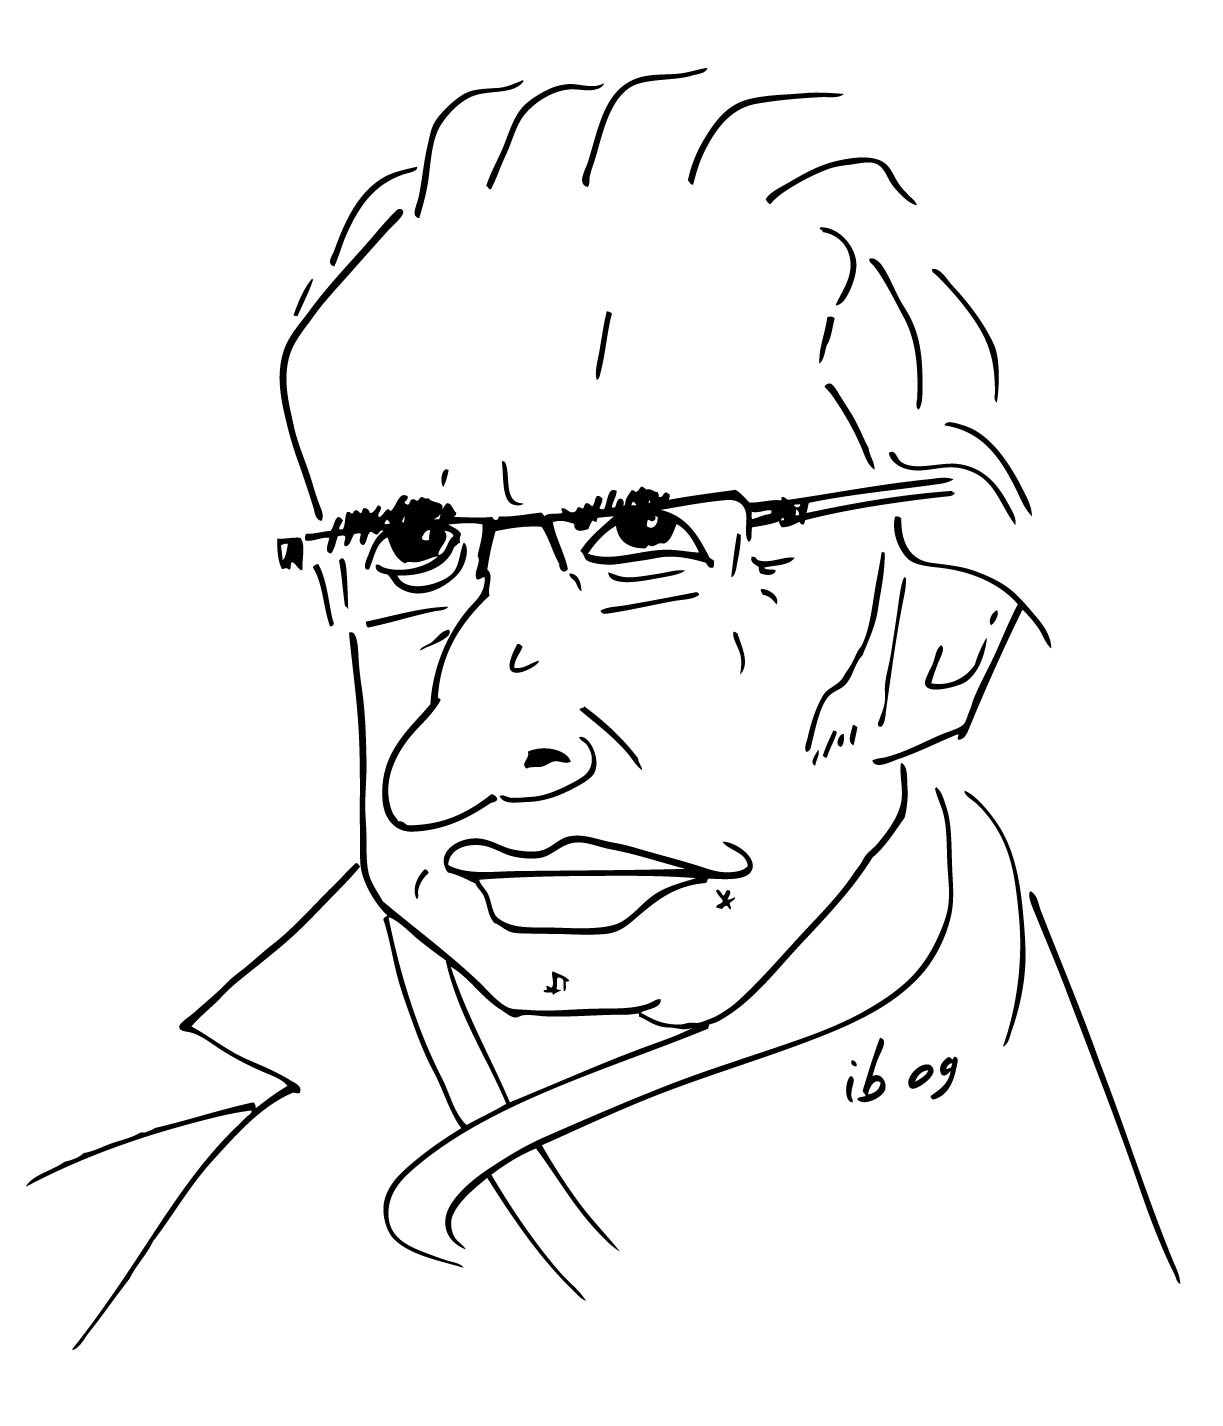 Martin Heylen 2008